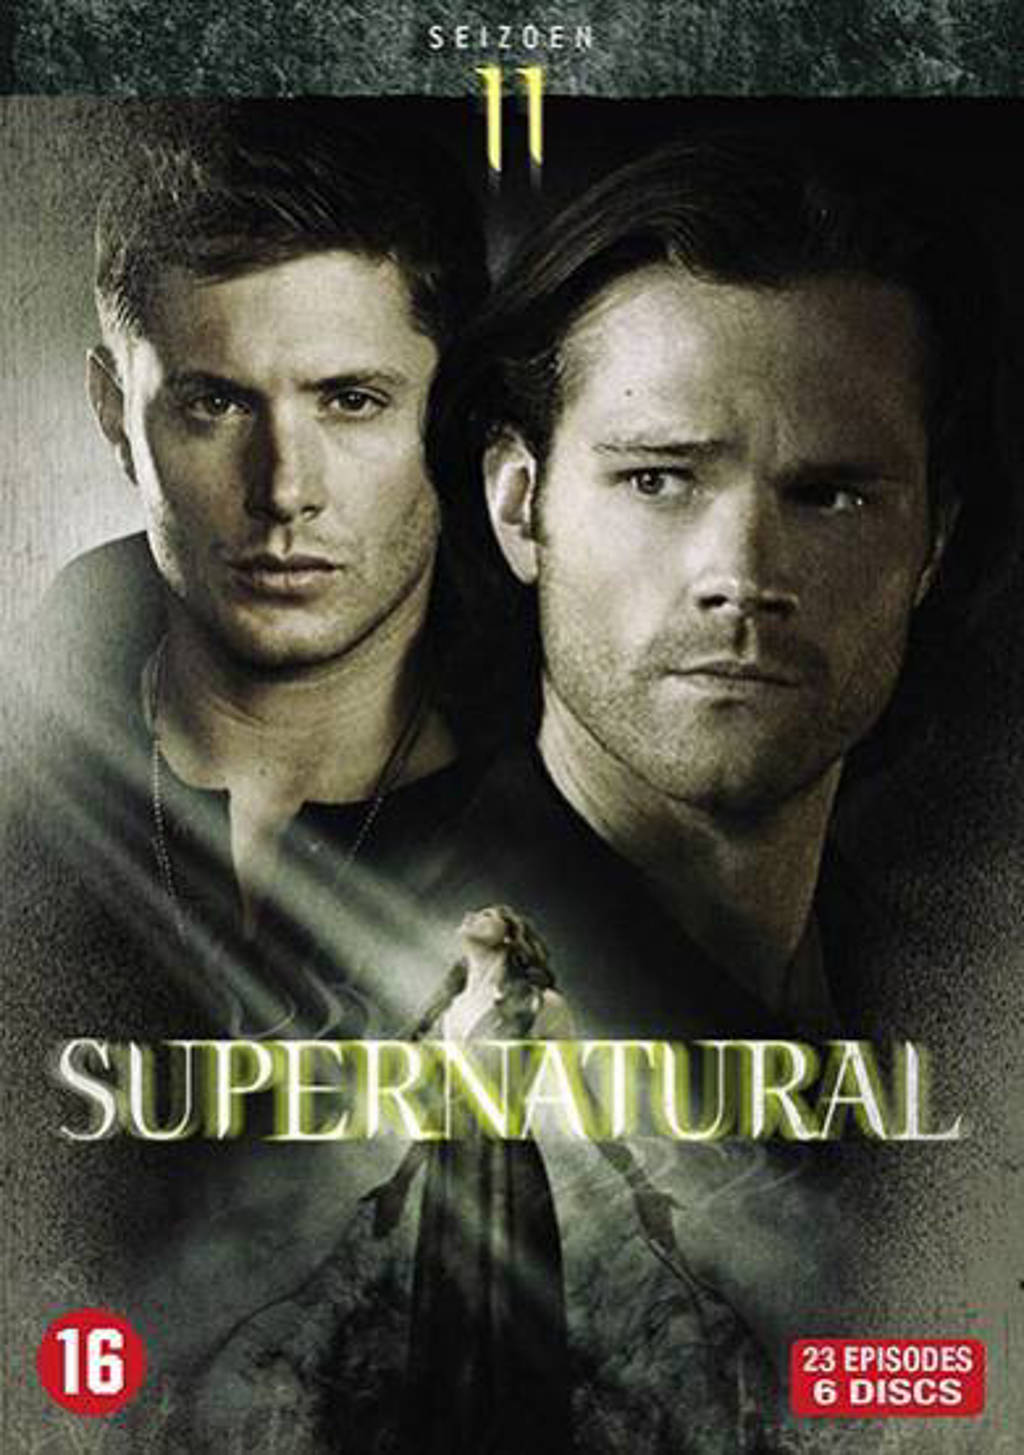 Supernatural - Seizoen 11 (DVD)